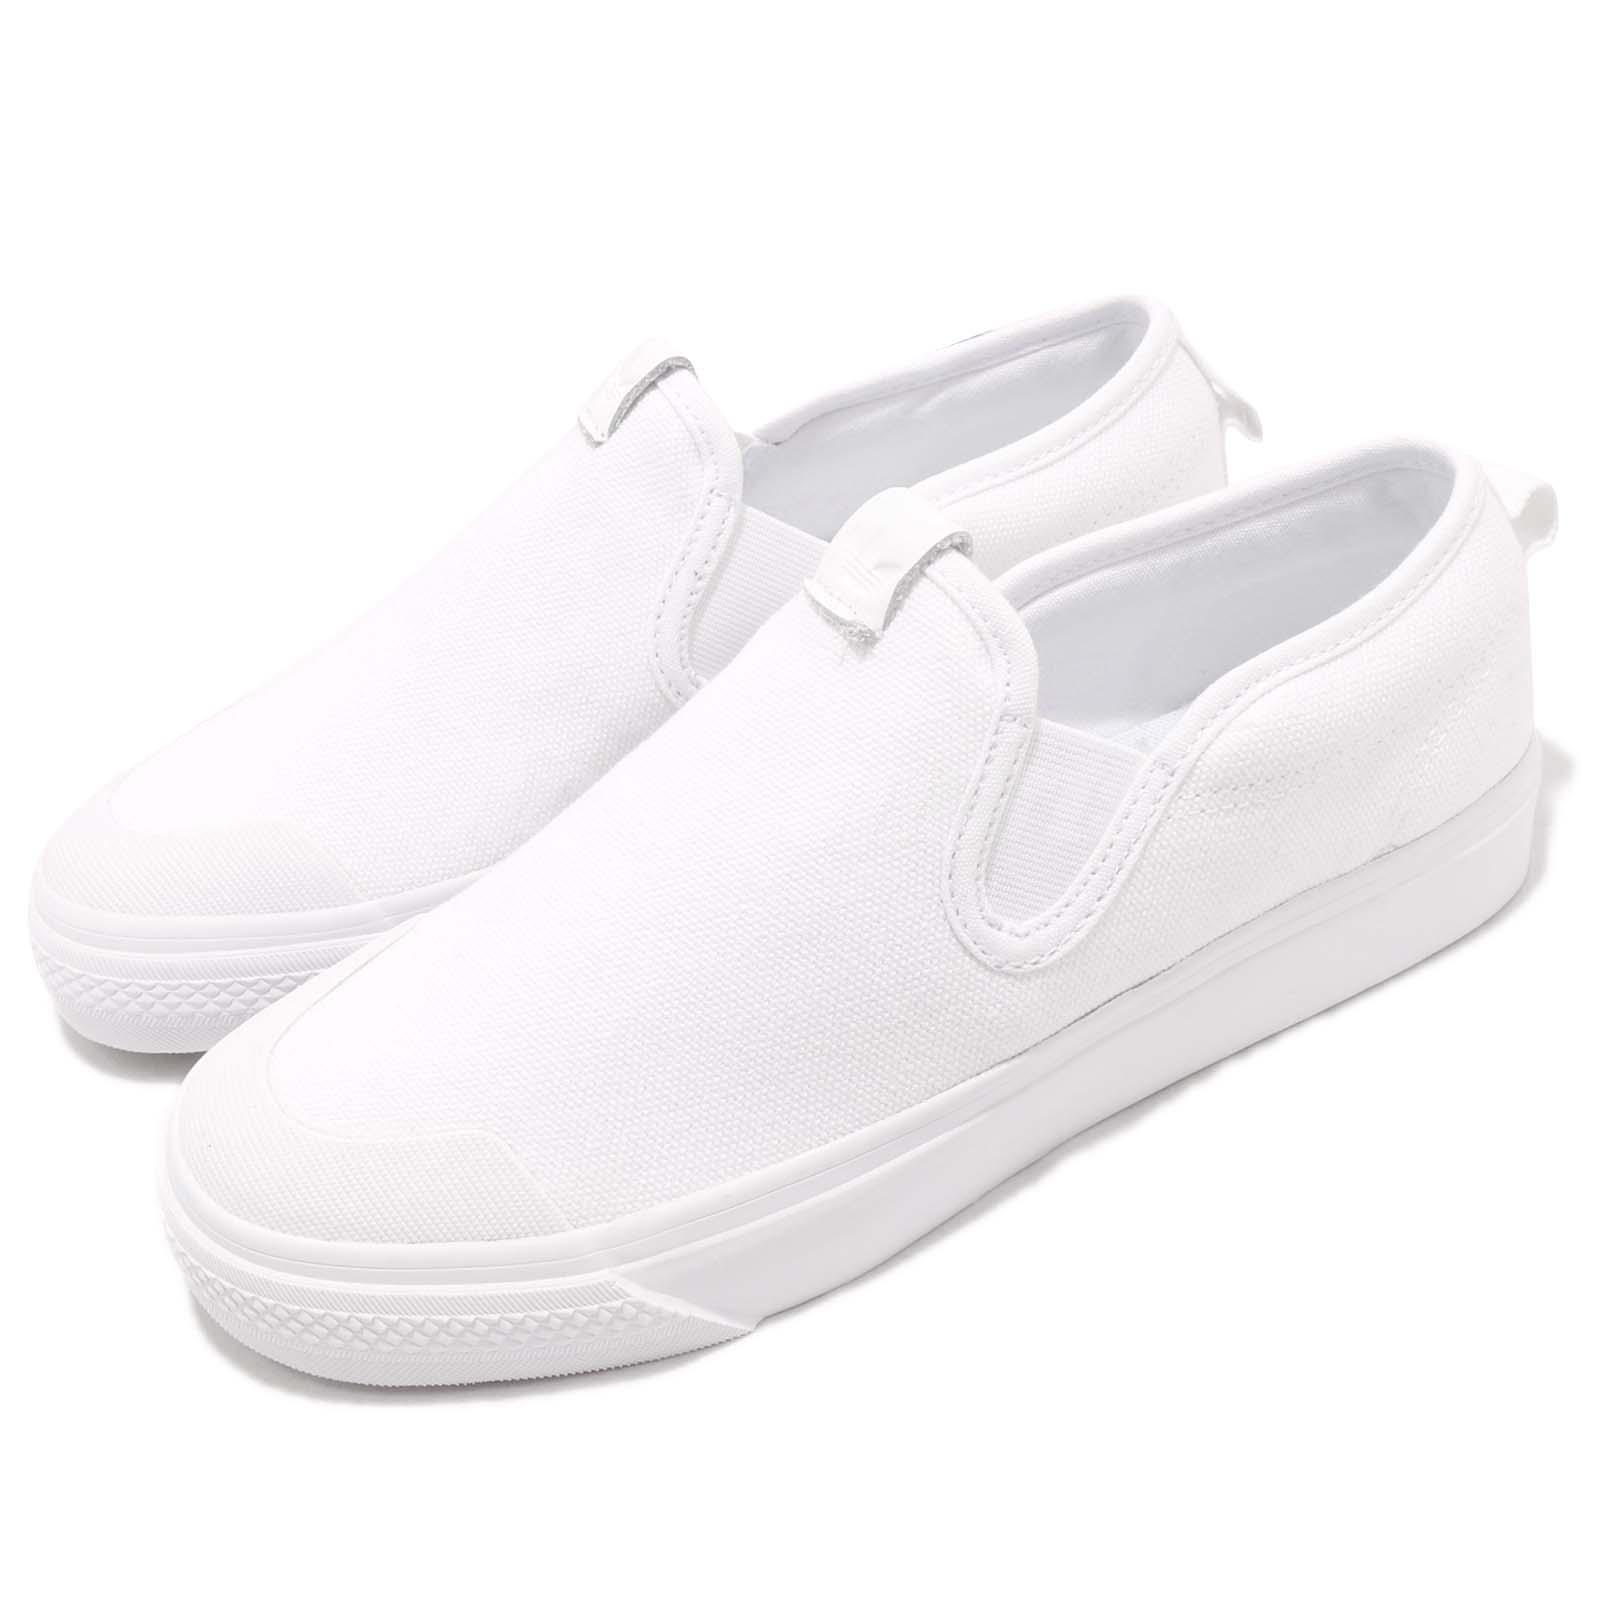 adidas Originals Nizza Slipon W White Women Slip On Casual ...